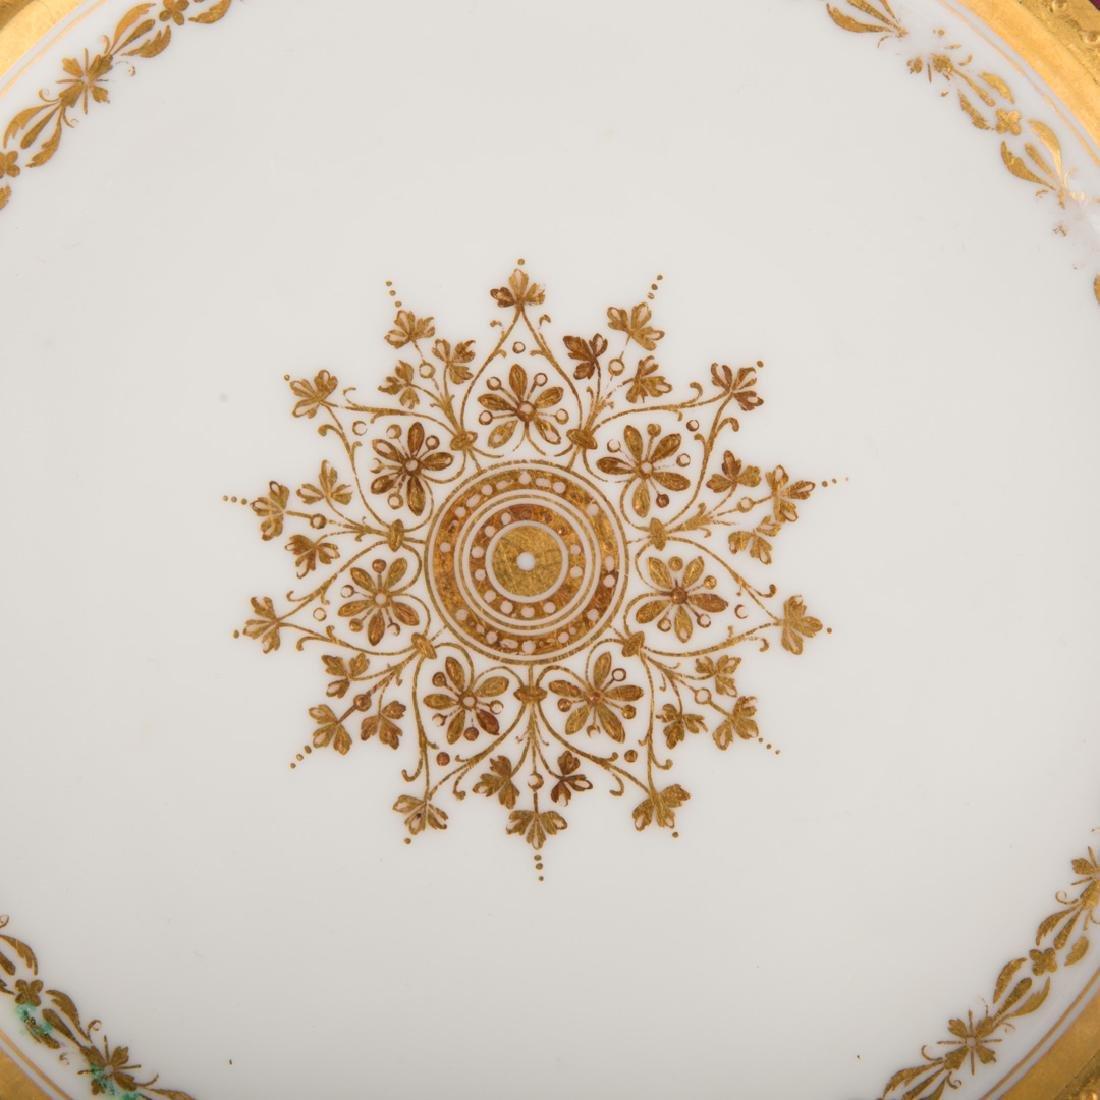 12 Vienna porcelain gilt & enamel decorated plates - 4